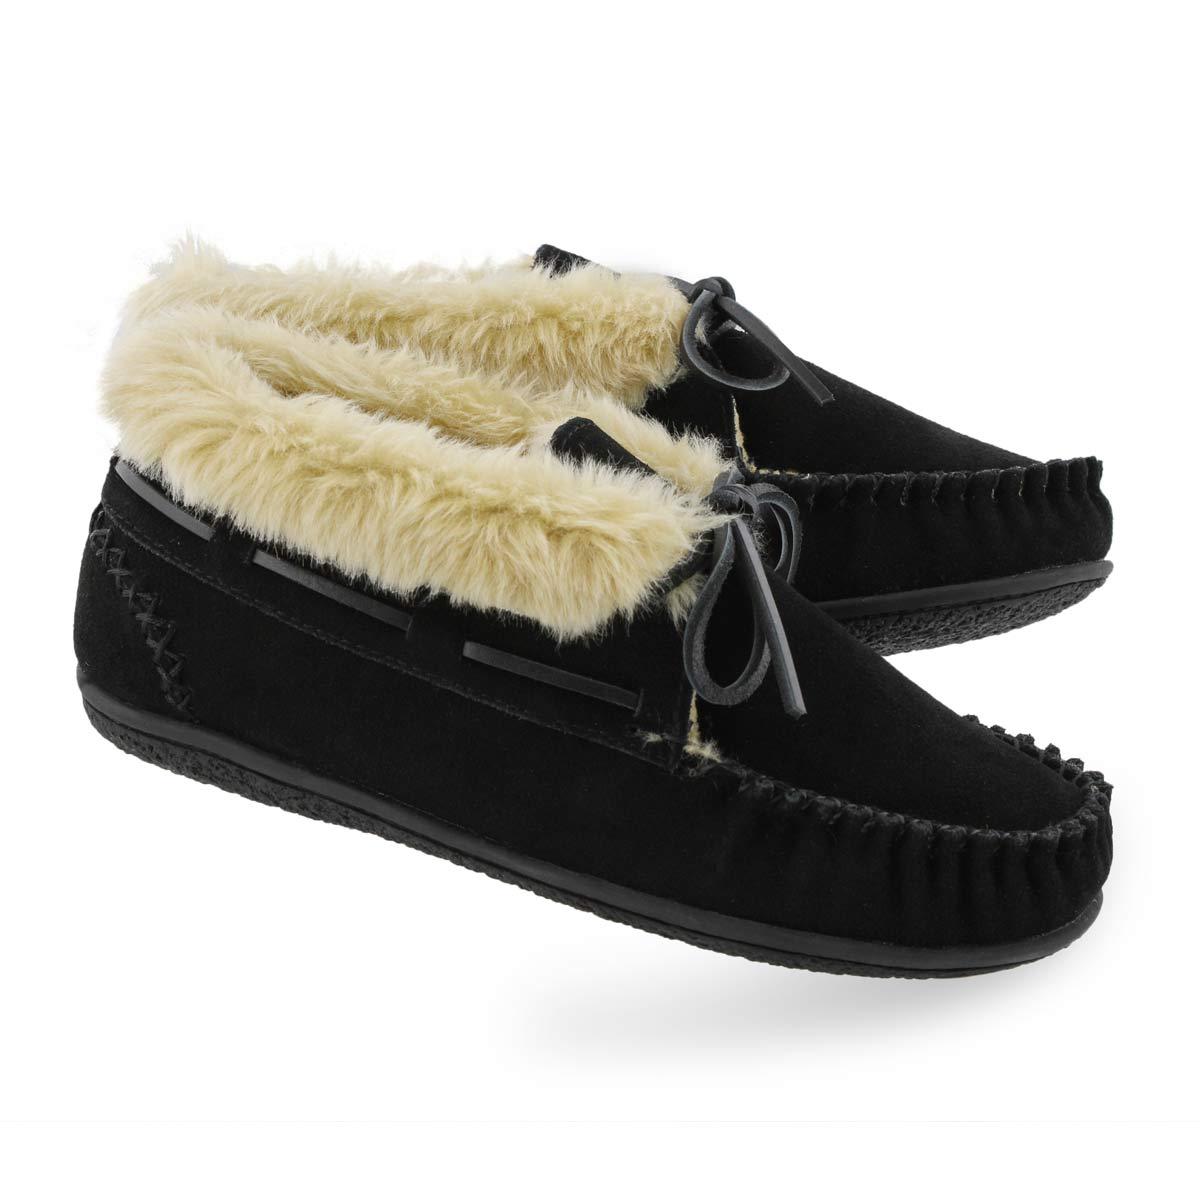 Women's BALI SUPREME HI black moccasin booties